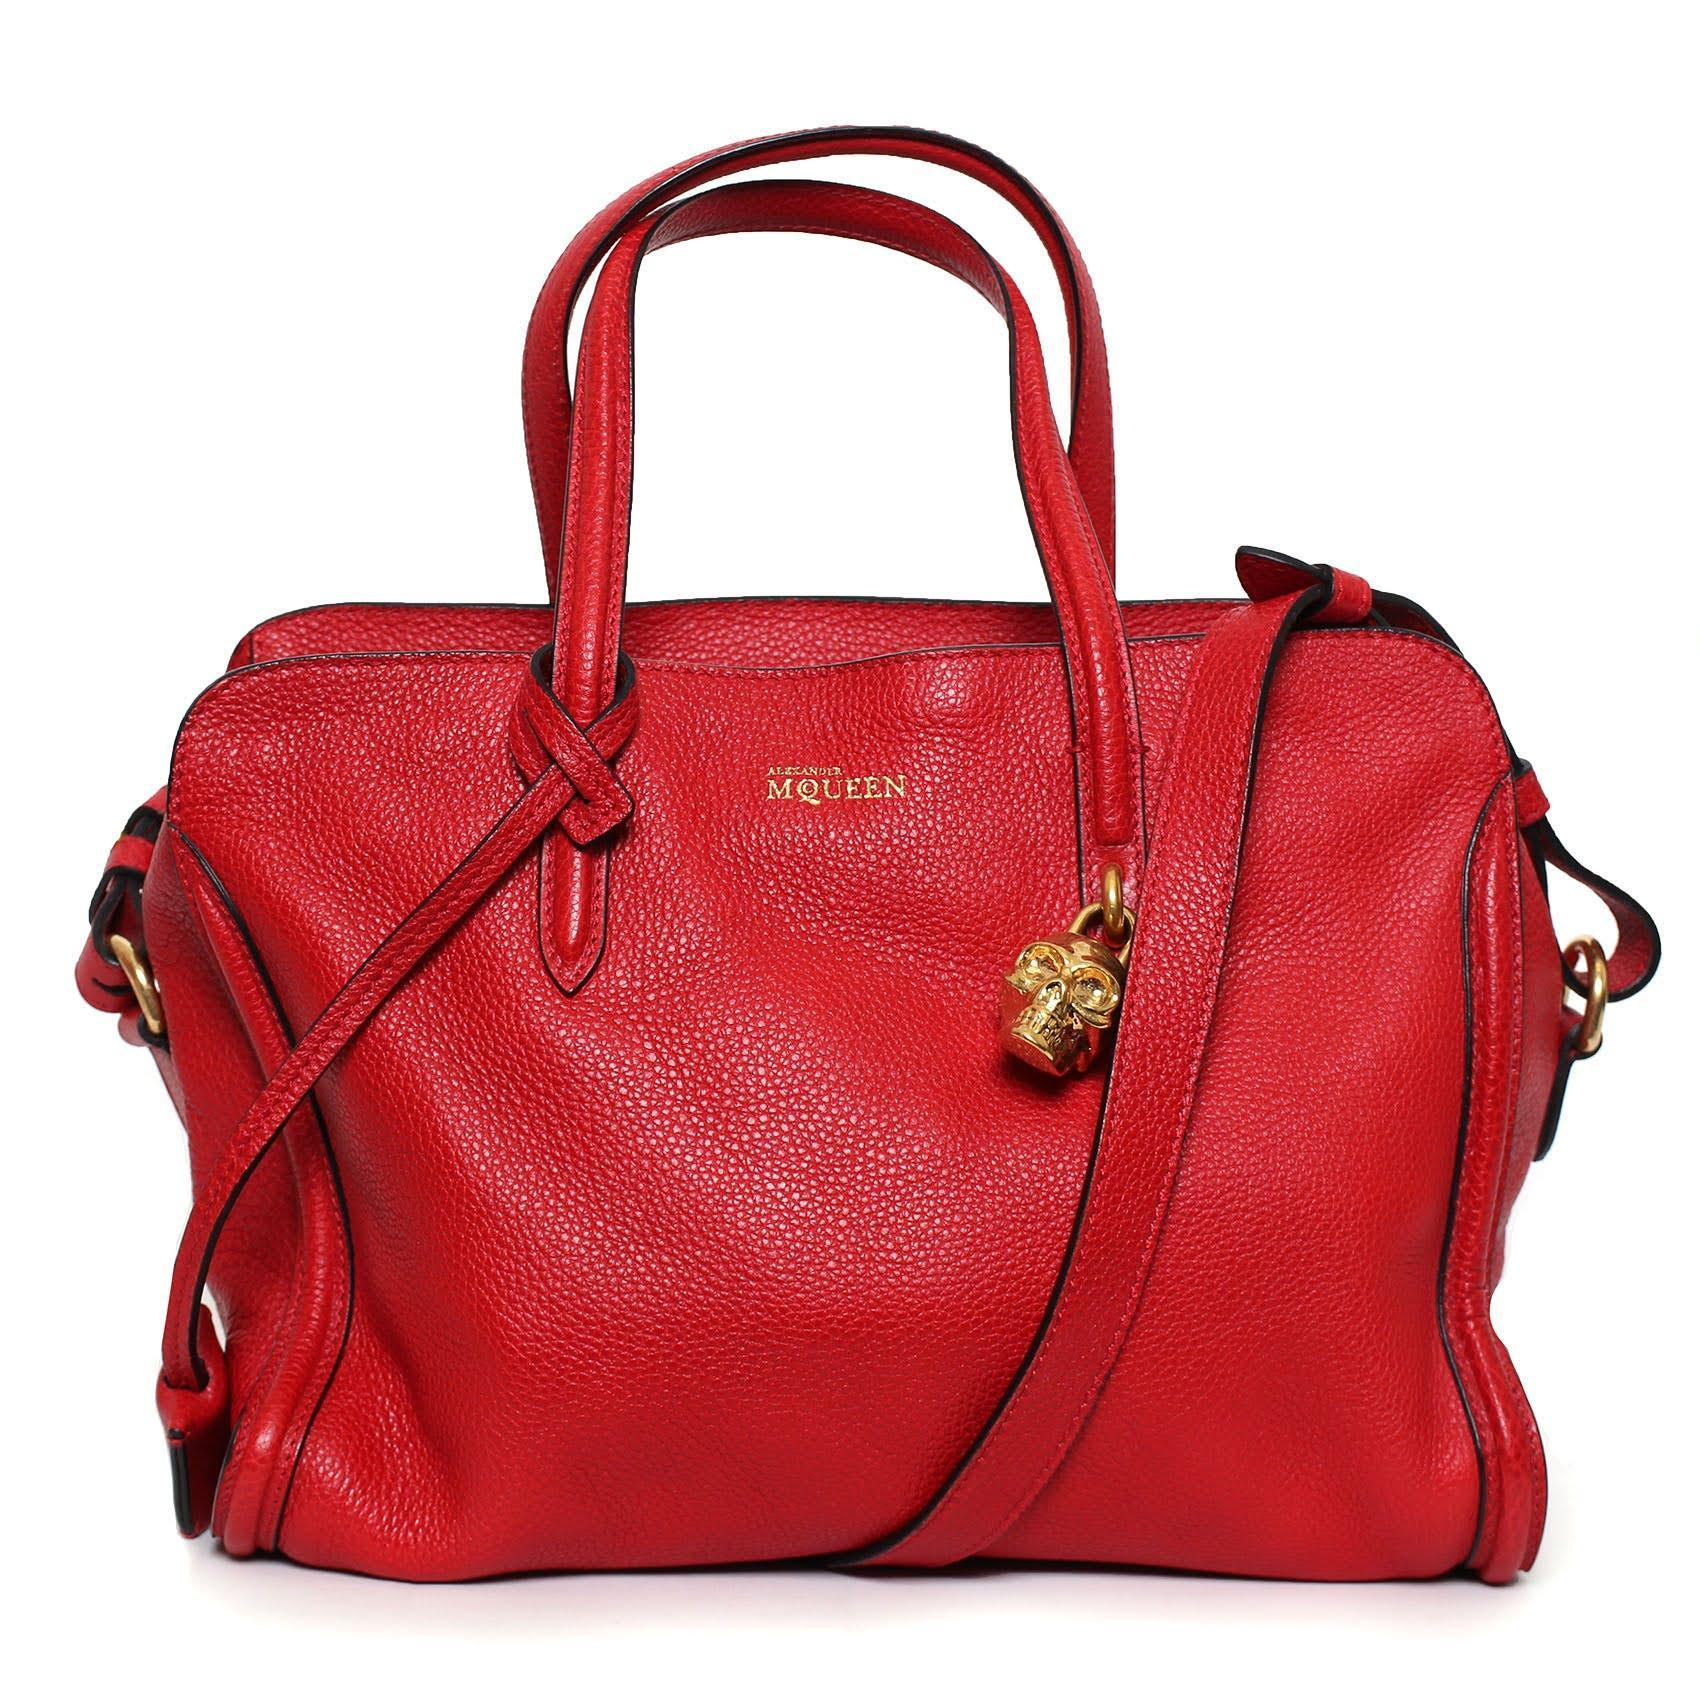 Alexander Mcqueen Red Leather Padlock Shoulder Bag